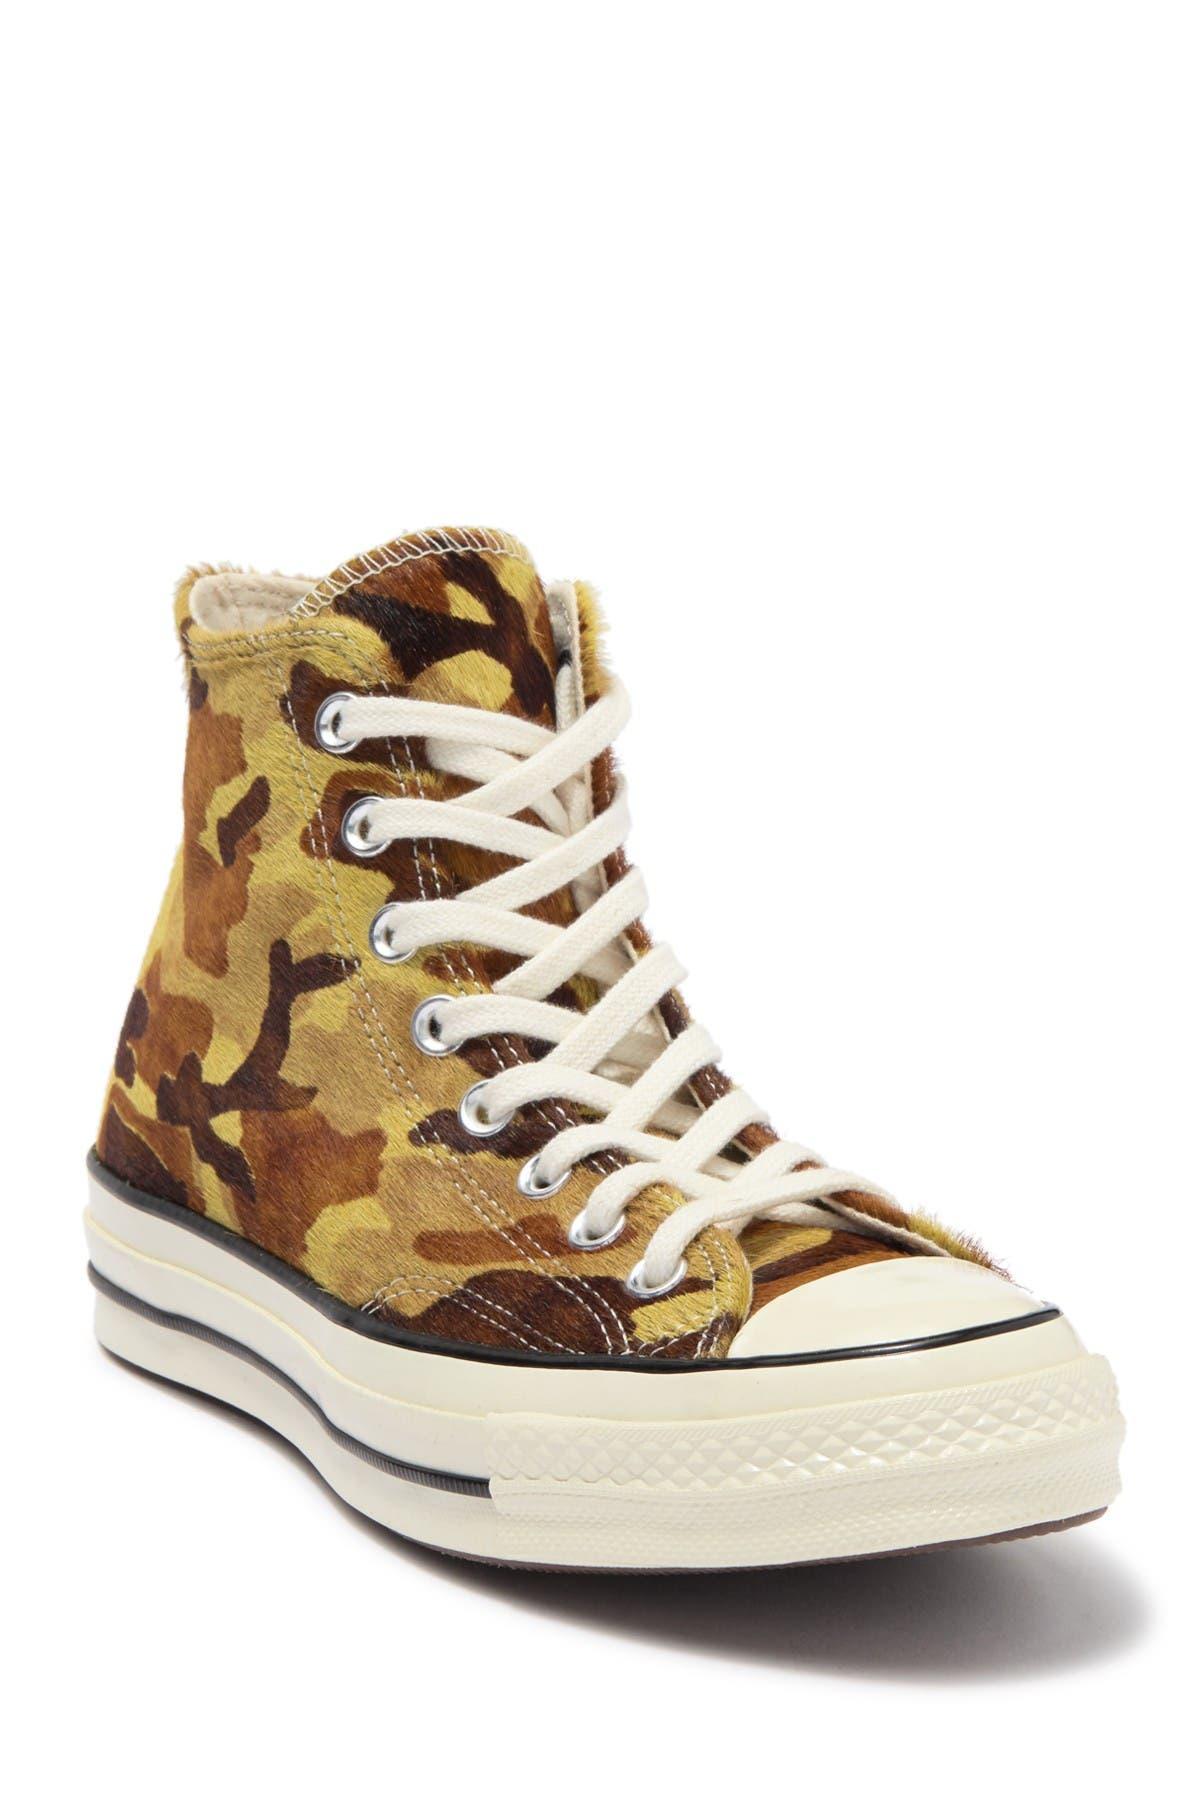 Image of Converse Chuck 70 Hi Top Camo Print Genuine Calf Hair Sneaker